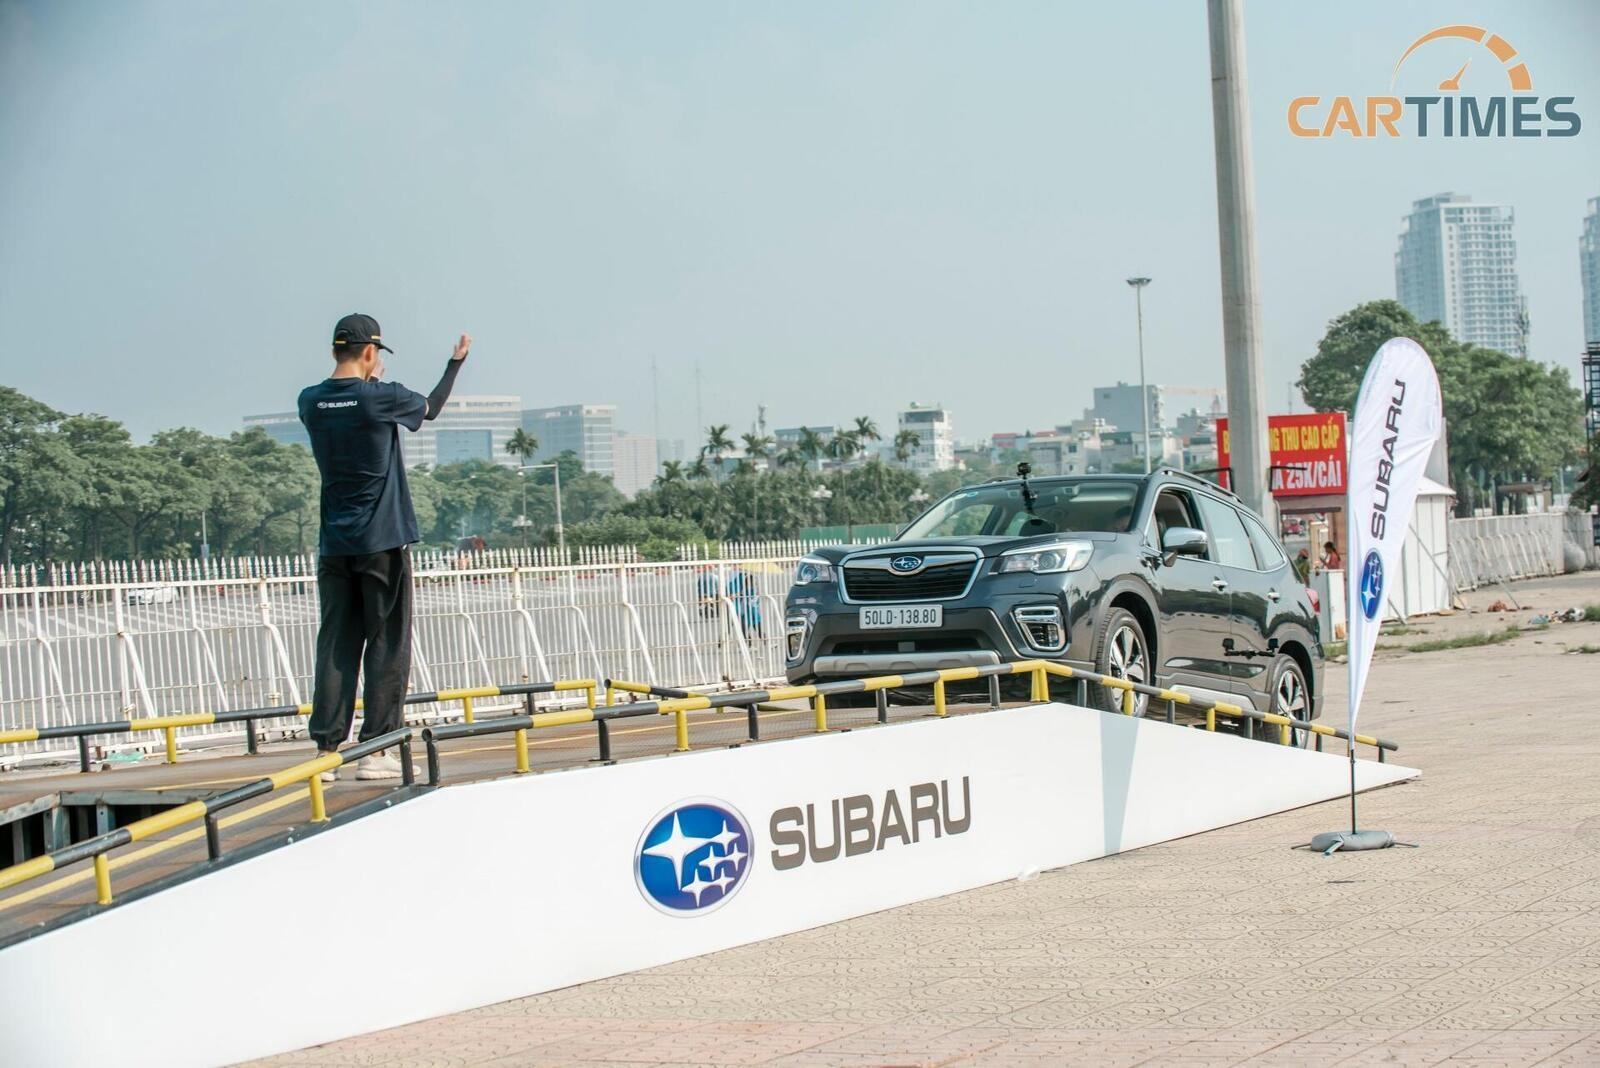 cuoi-tuan-trai-nghiem-su-kien-lai-thu-subaru-ultimate-test-drive-tai-my-dinh-1(1).jpg